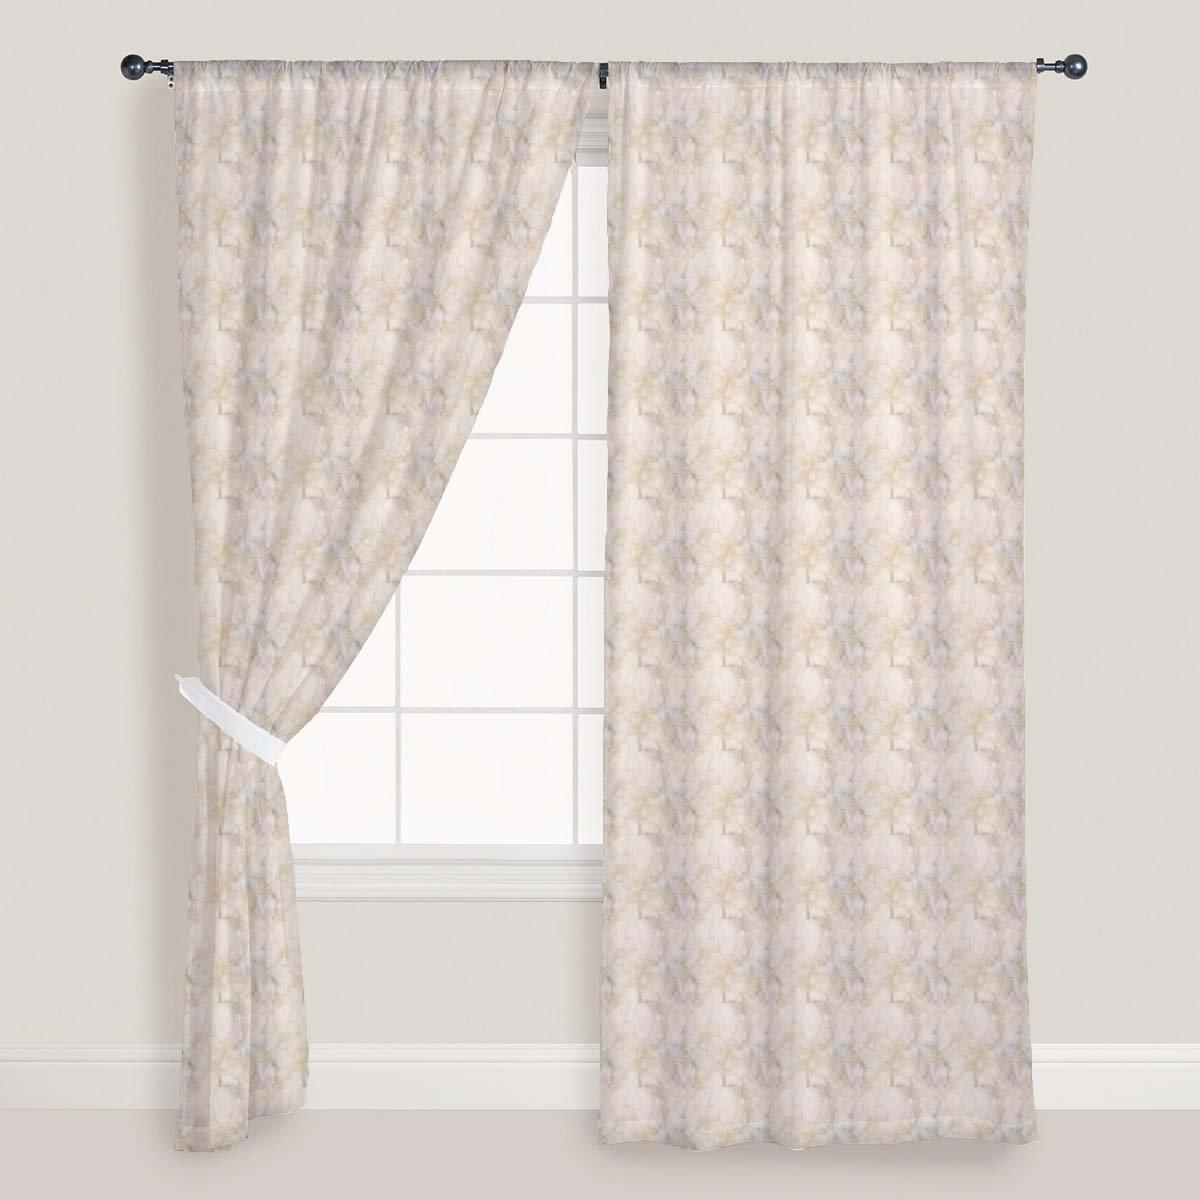 AZ Pink & Peach Marble Door & Window Curtain Satin 4feet x 9feet; SET OF 3 PCS